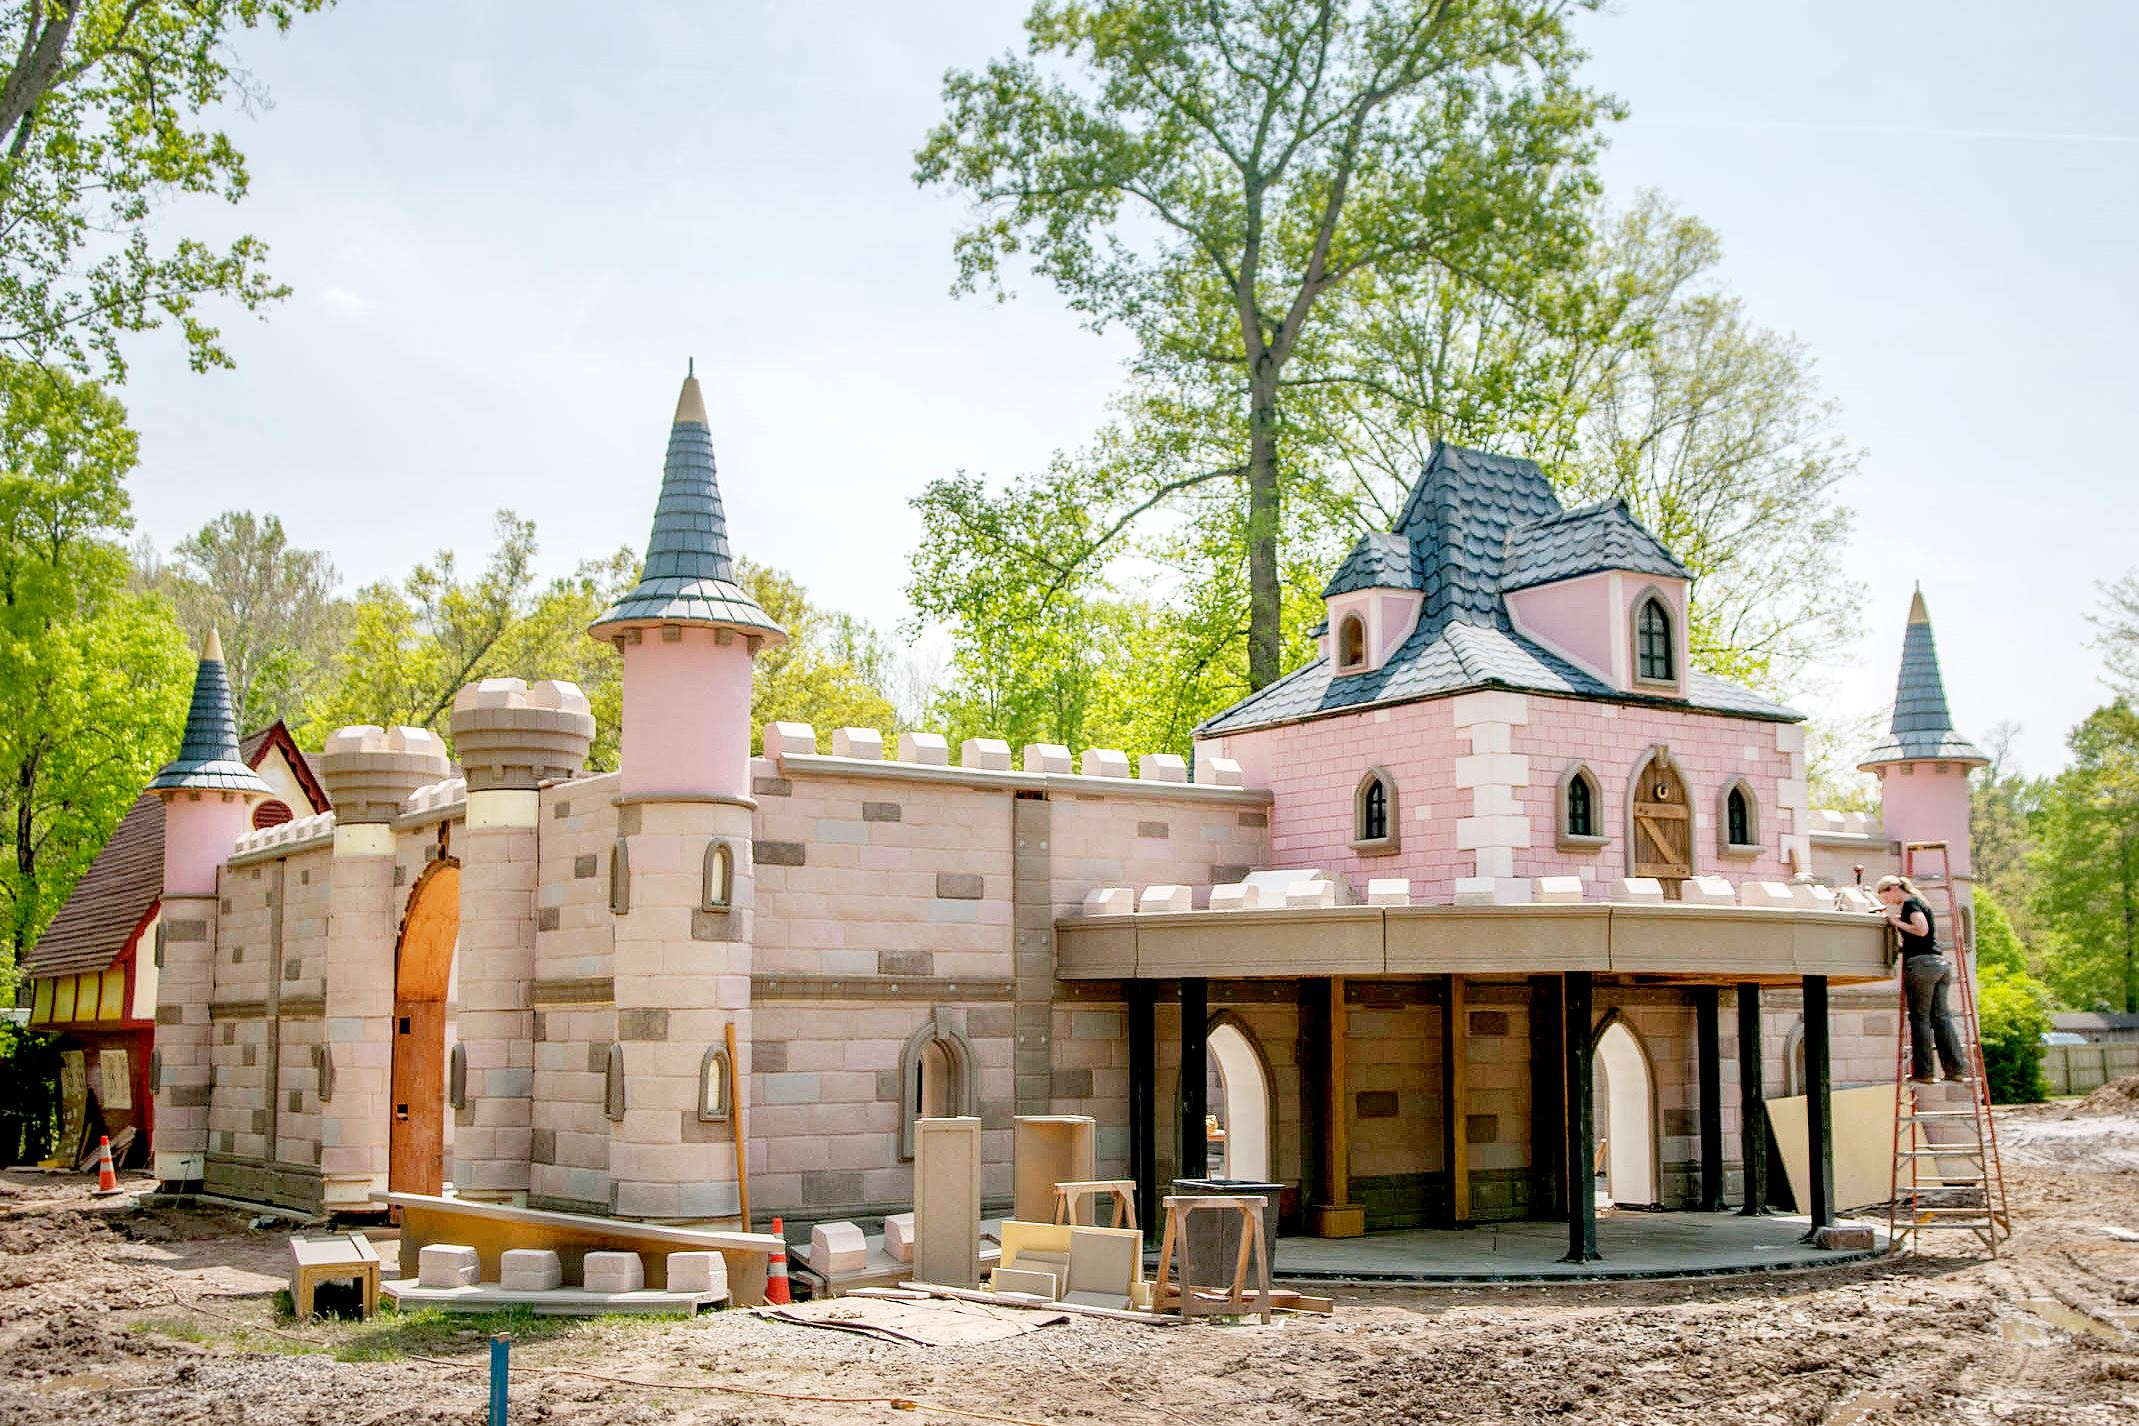 Idewild Castle